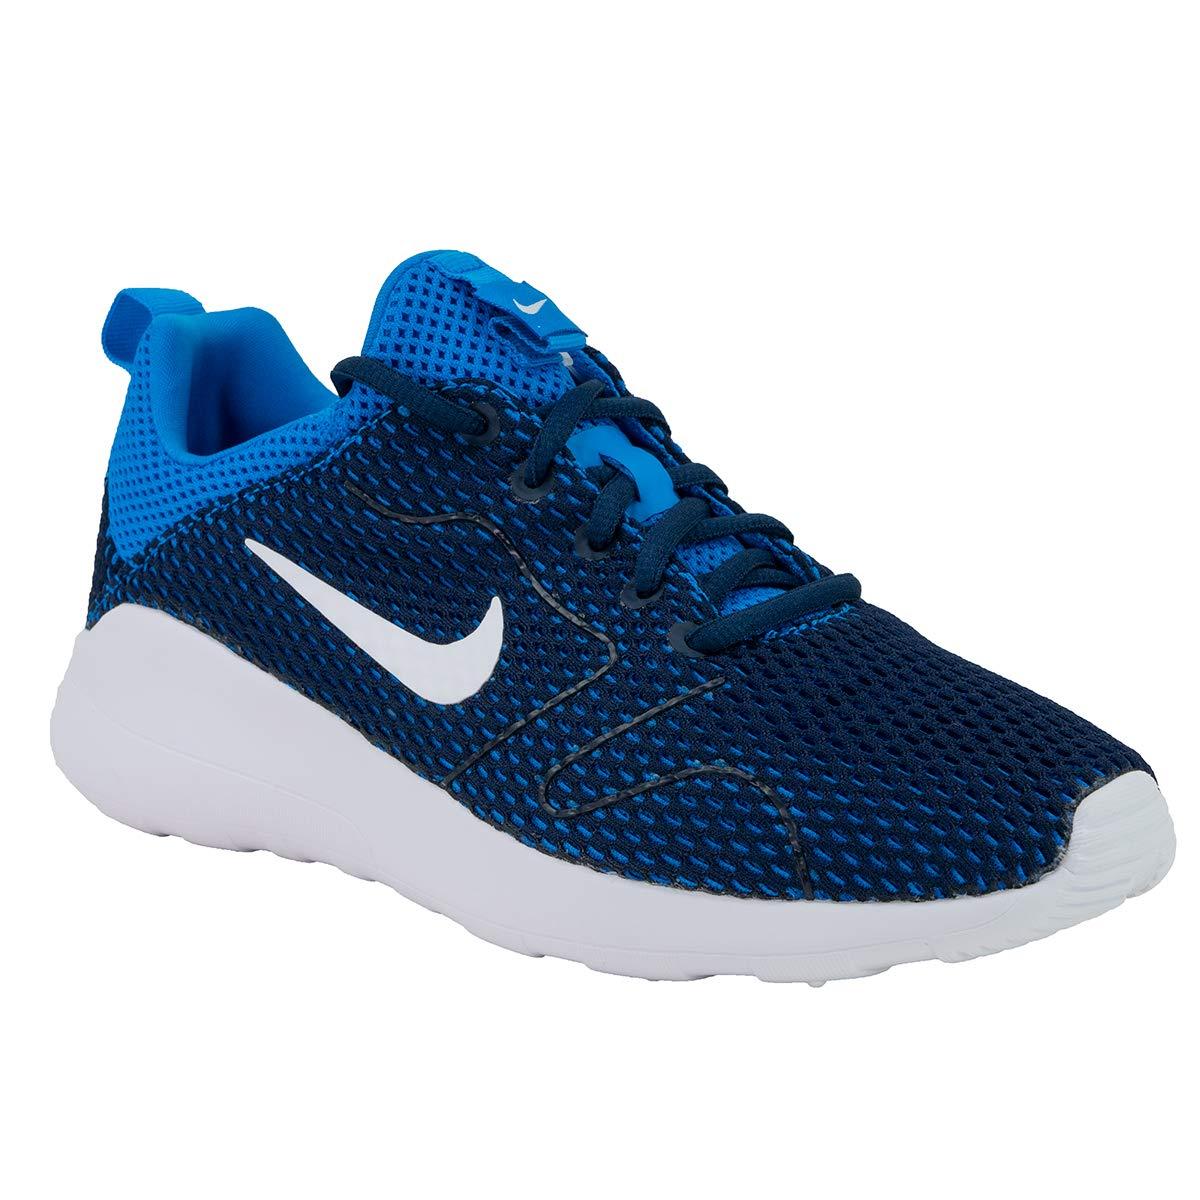 watch aad40 45062 Galleon - NIKE Men s Kaishi 2.0 SE Running Shoes Midnight Navy White Photo  Blue 7.5